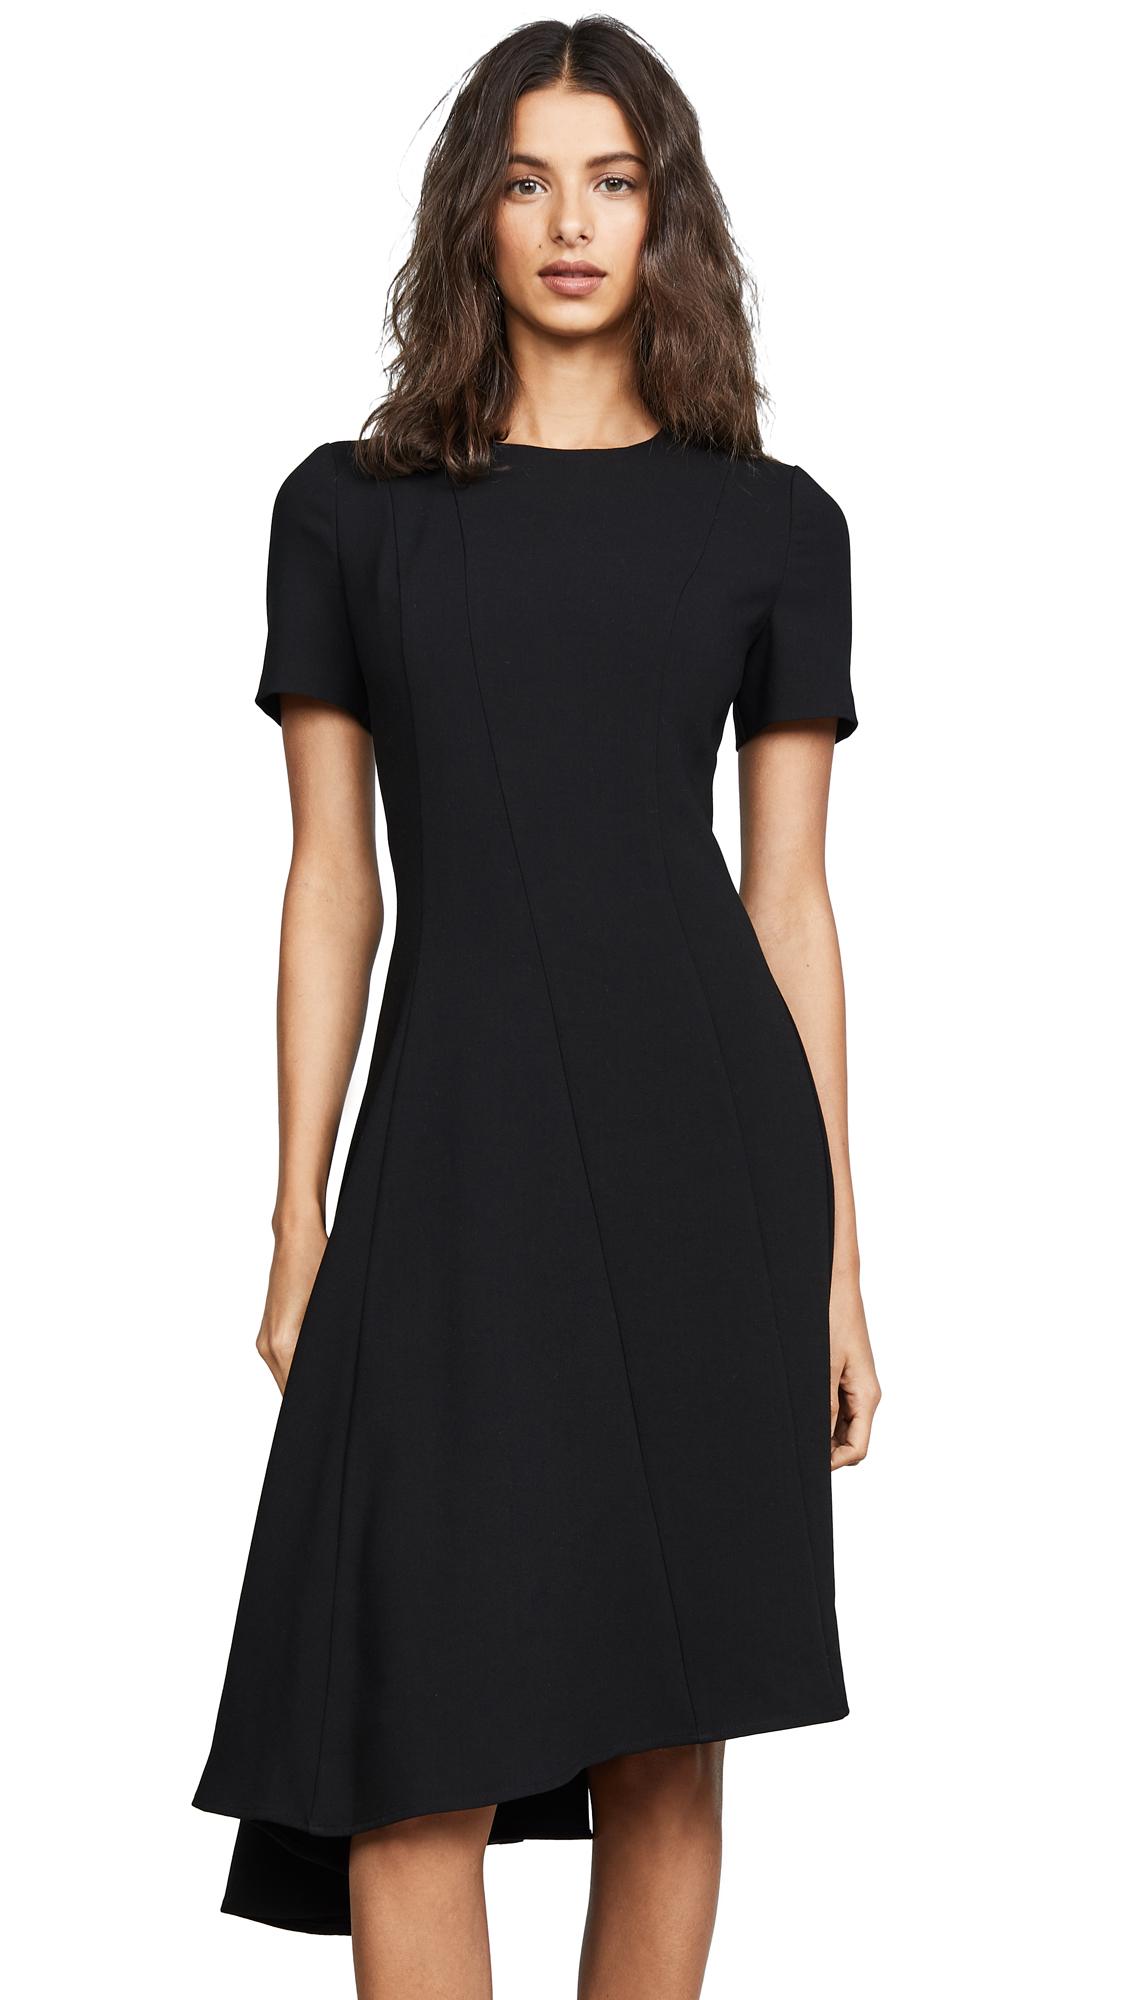 Black Halo Olcay Asymmetrical Dress - Black